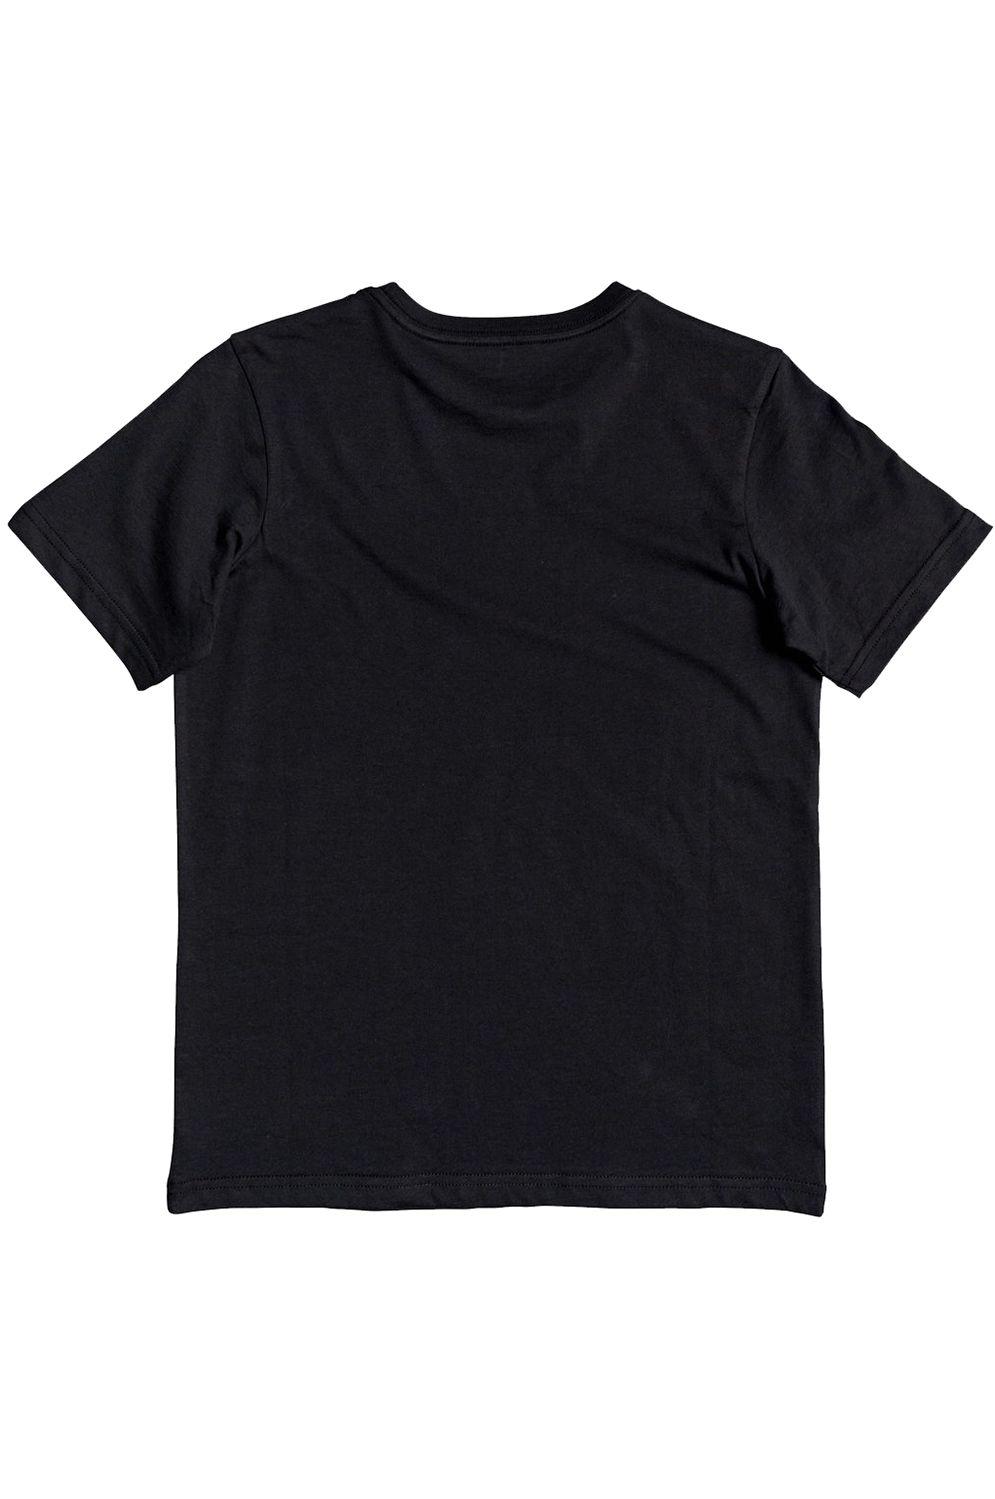 Quiksilver T-Shirt STONECOLDSSYTH B Black